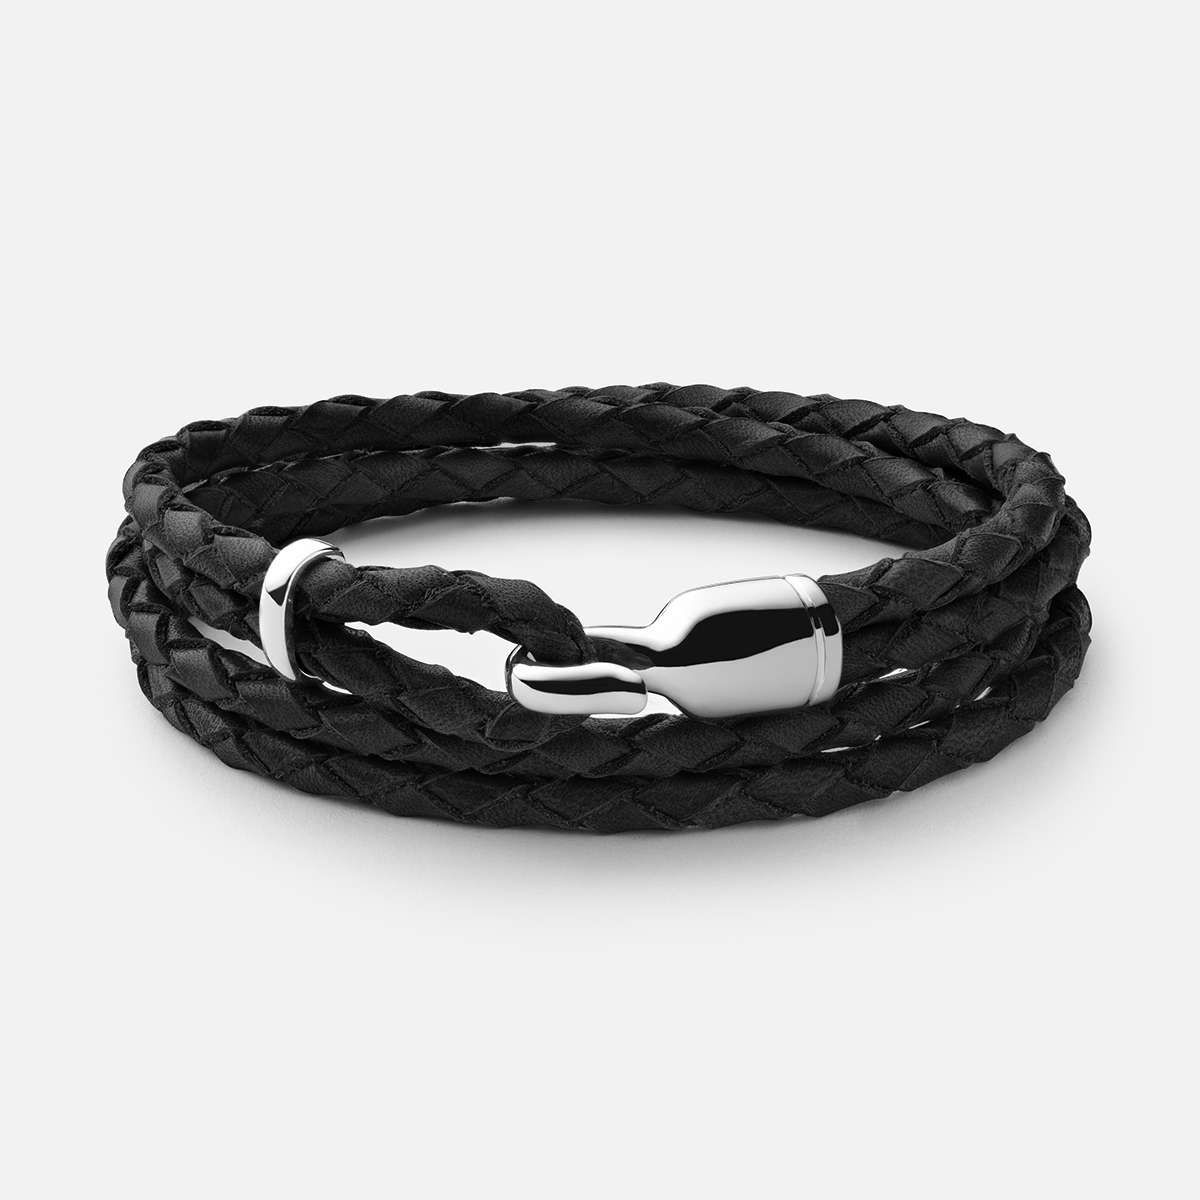 Bracelets Bracelets For Men Black Leather Bracelet